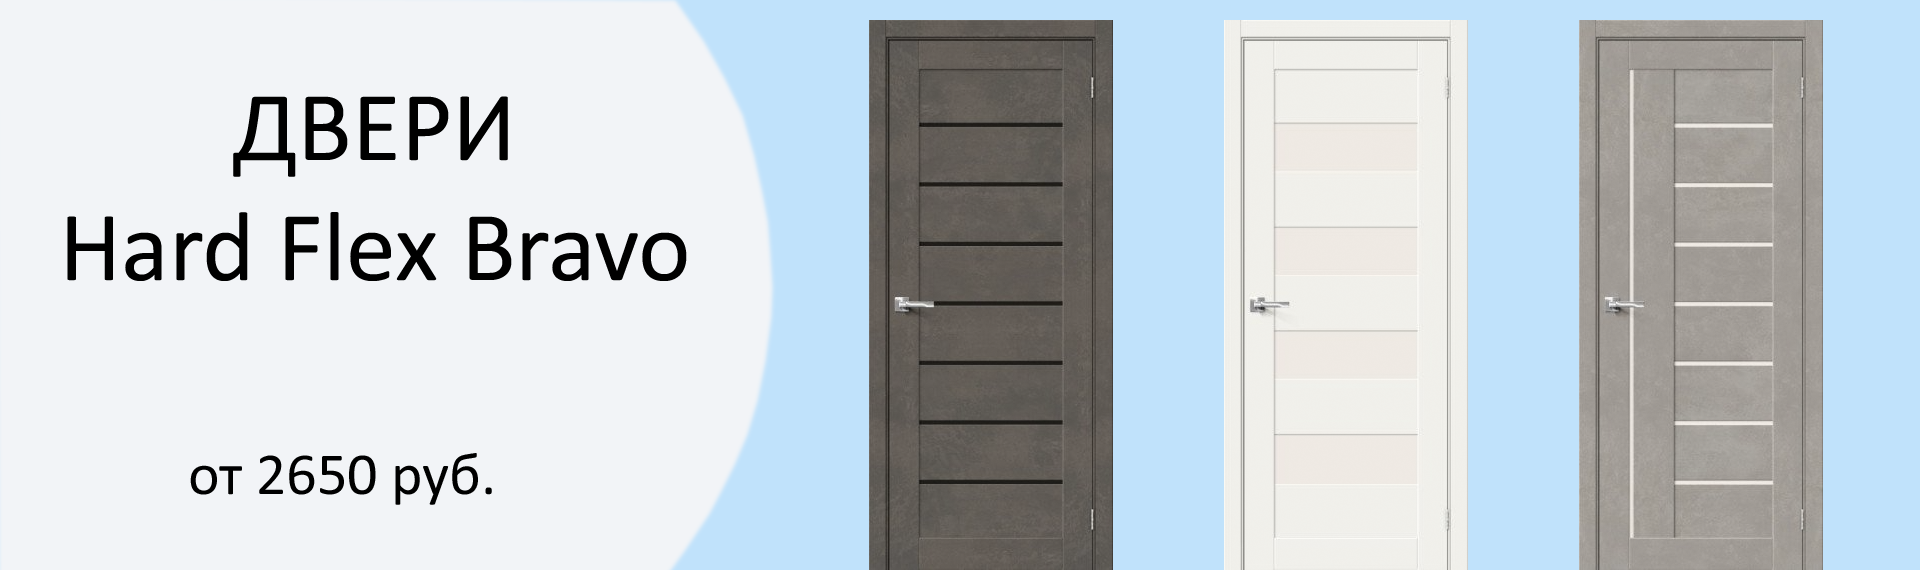 металлические двери коломне